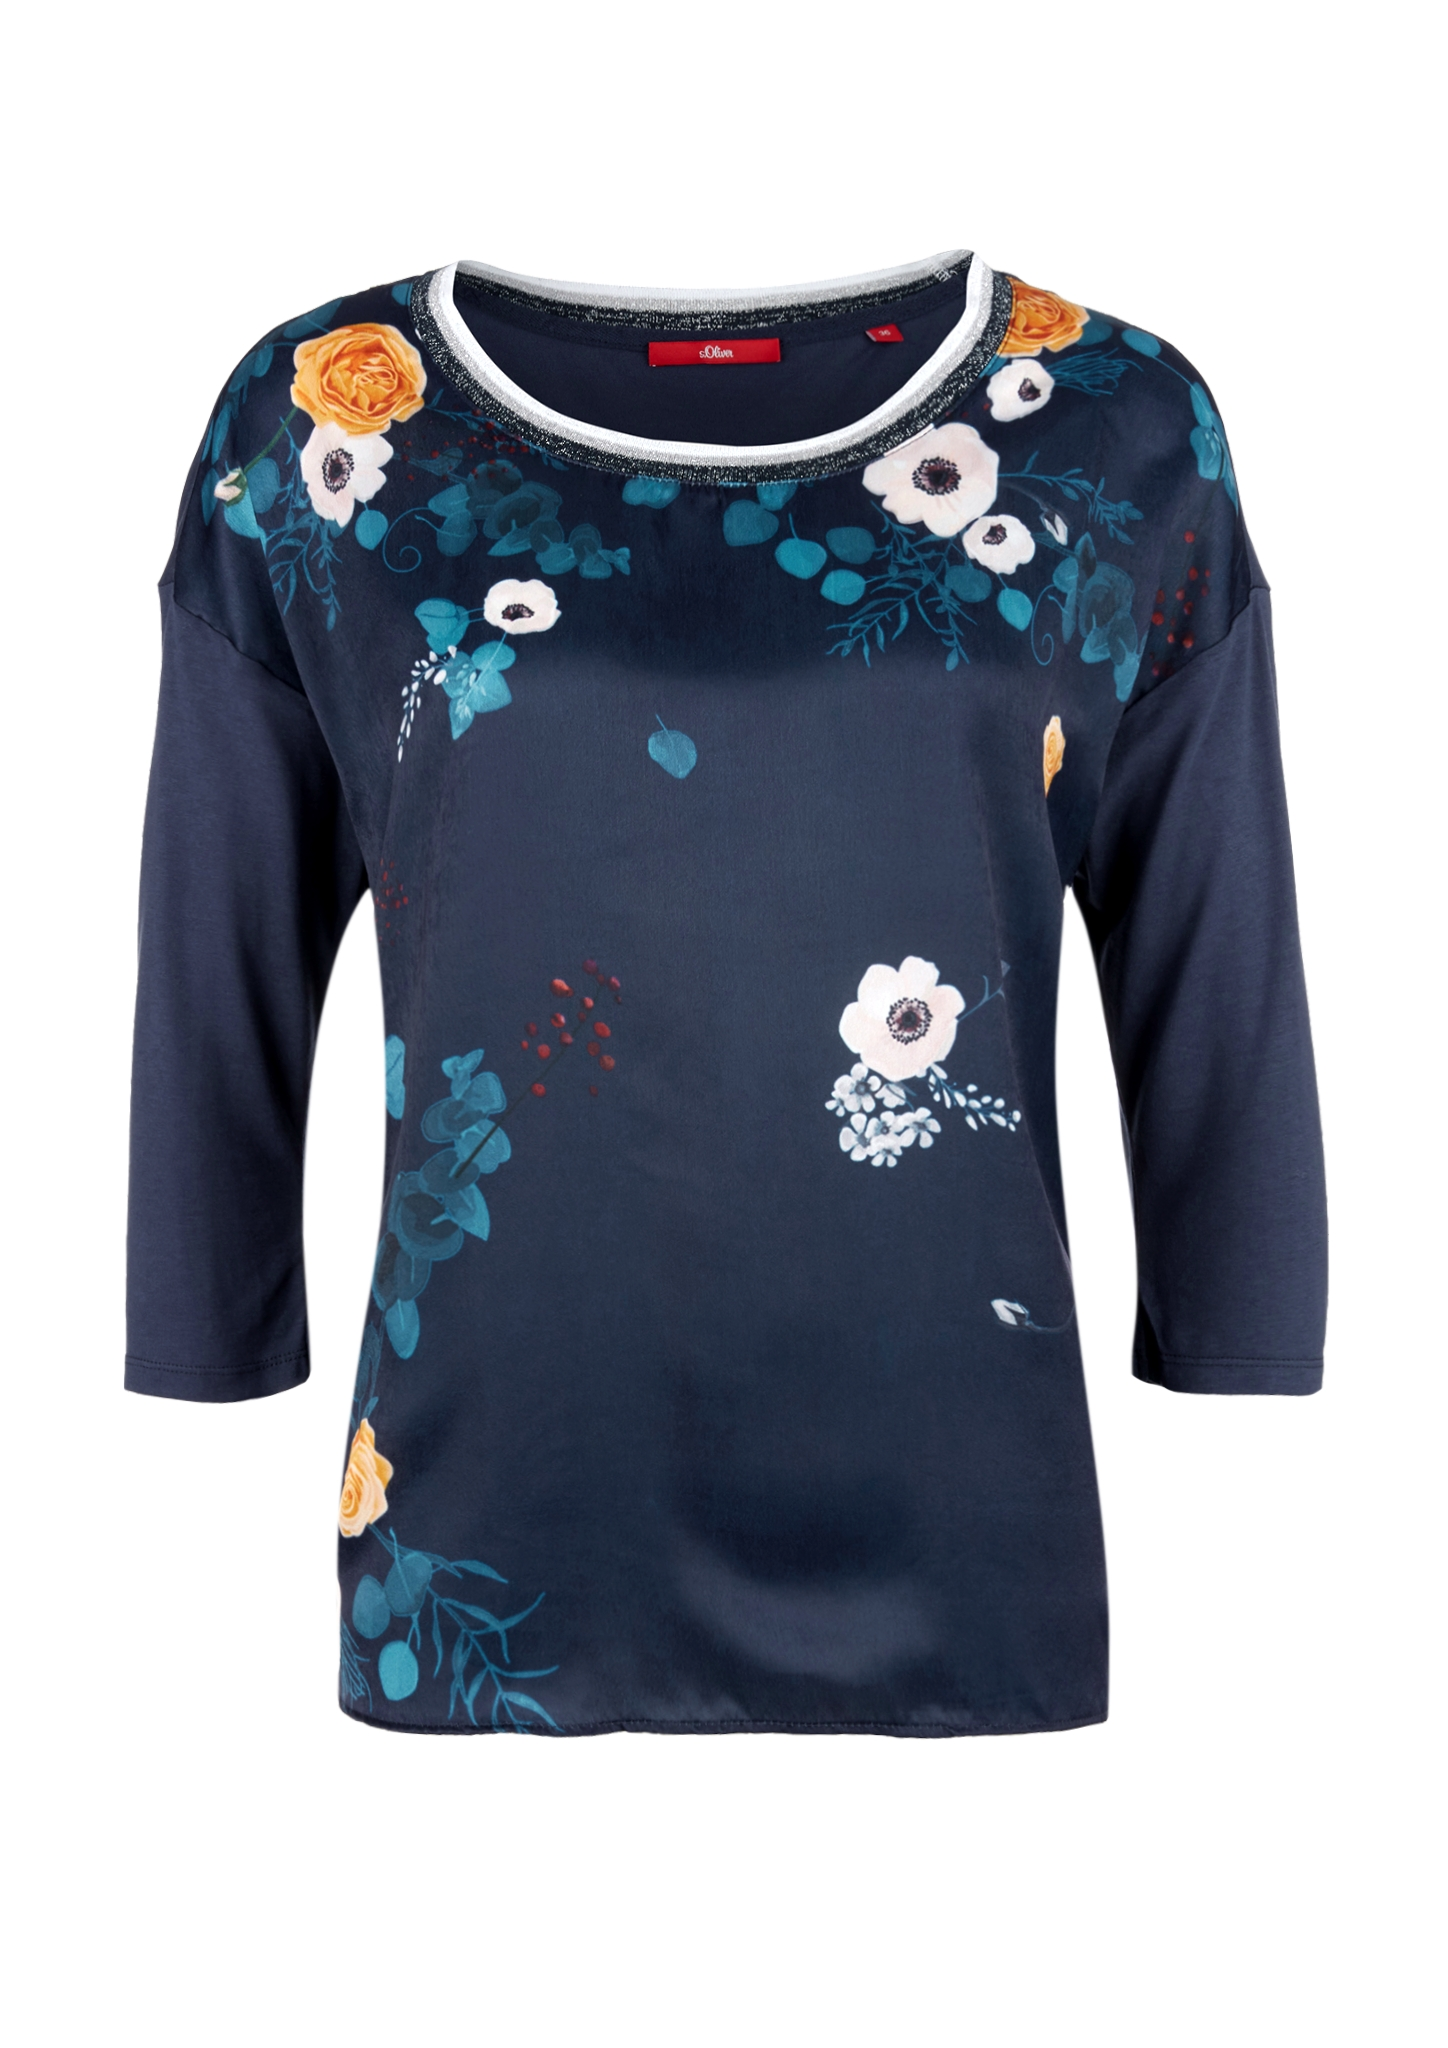 Image of Fabric Mix-Shirt mit 3/4-Arm